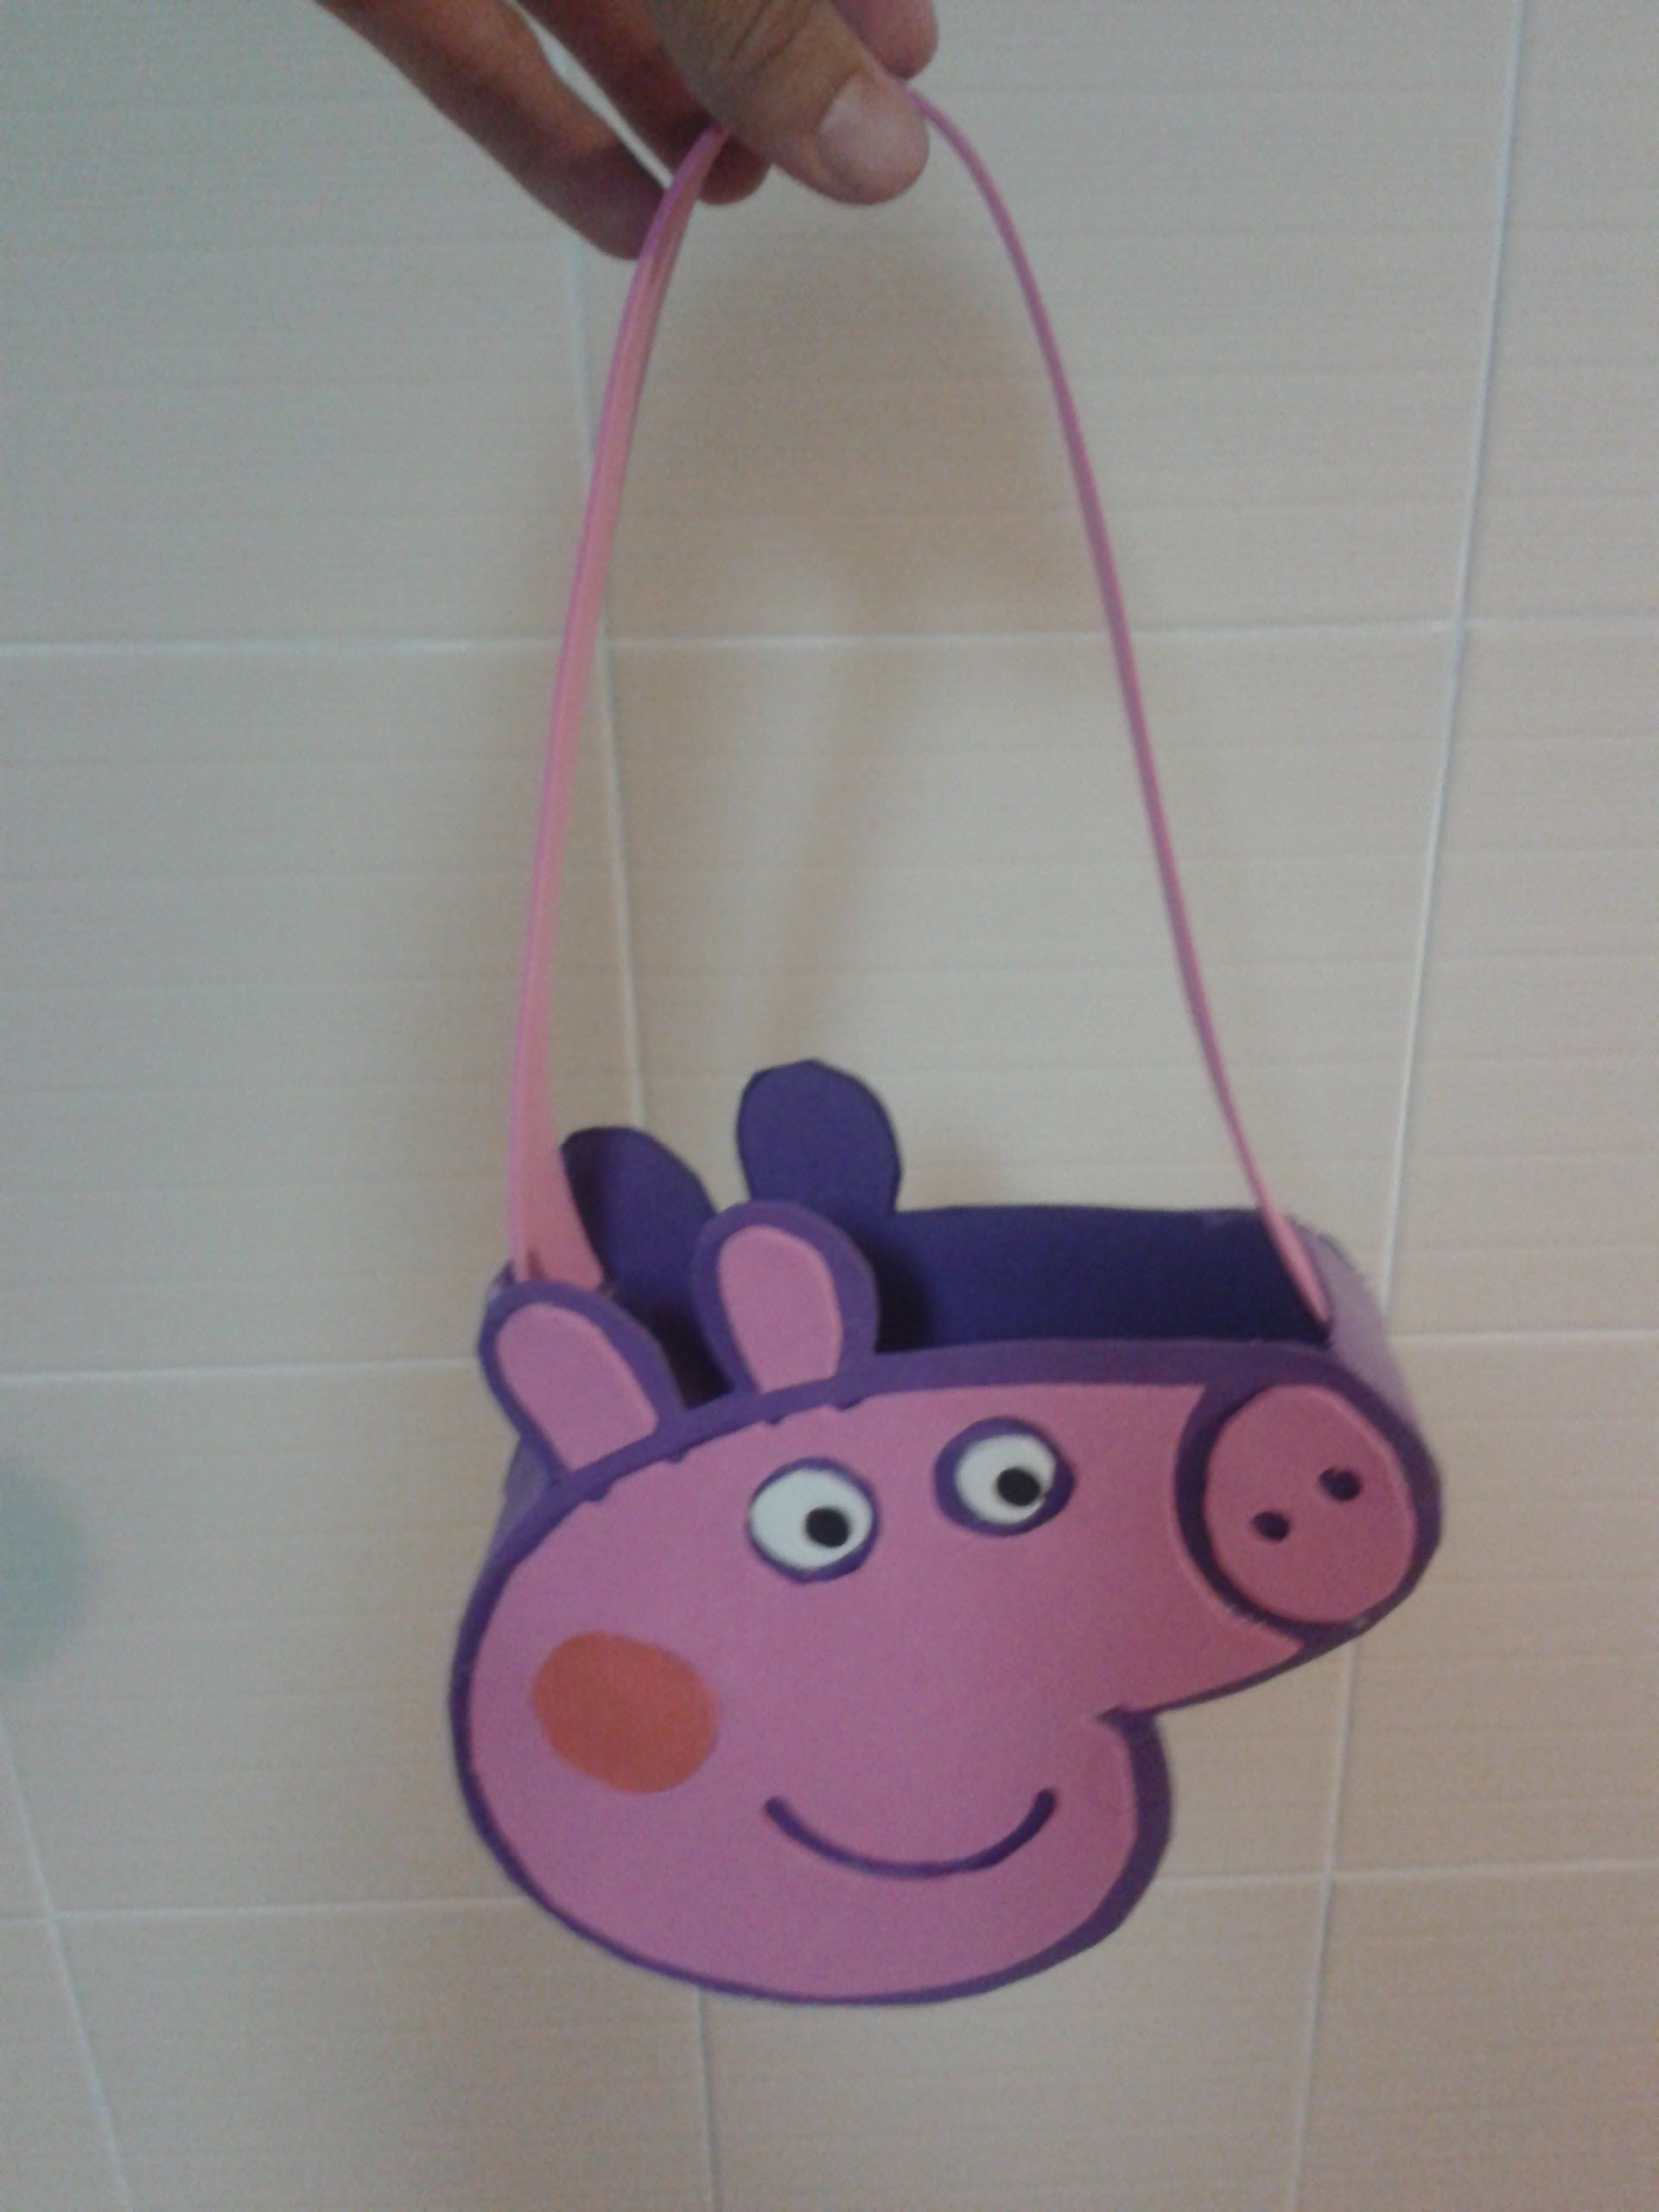 manualidades bolso dulcero peppa pig purse peppa pig de goma eva